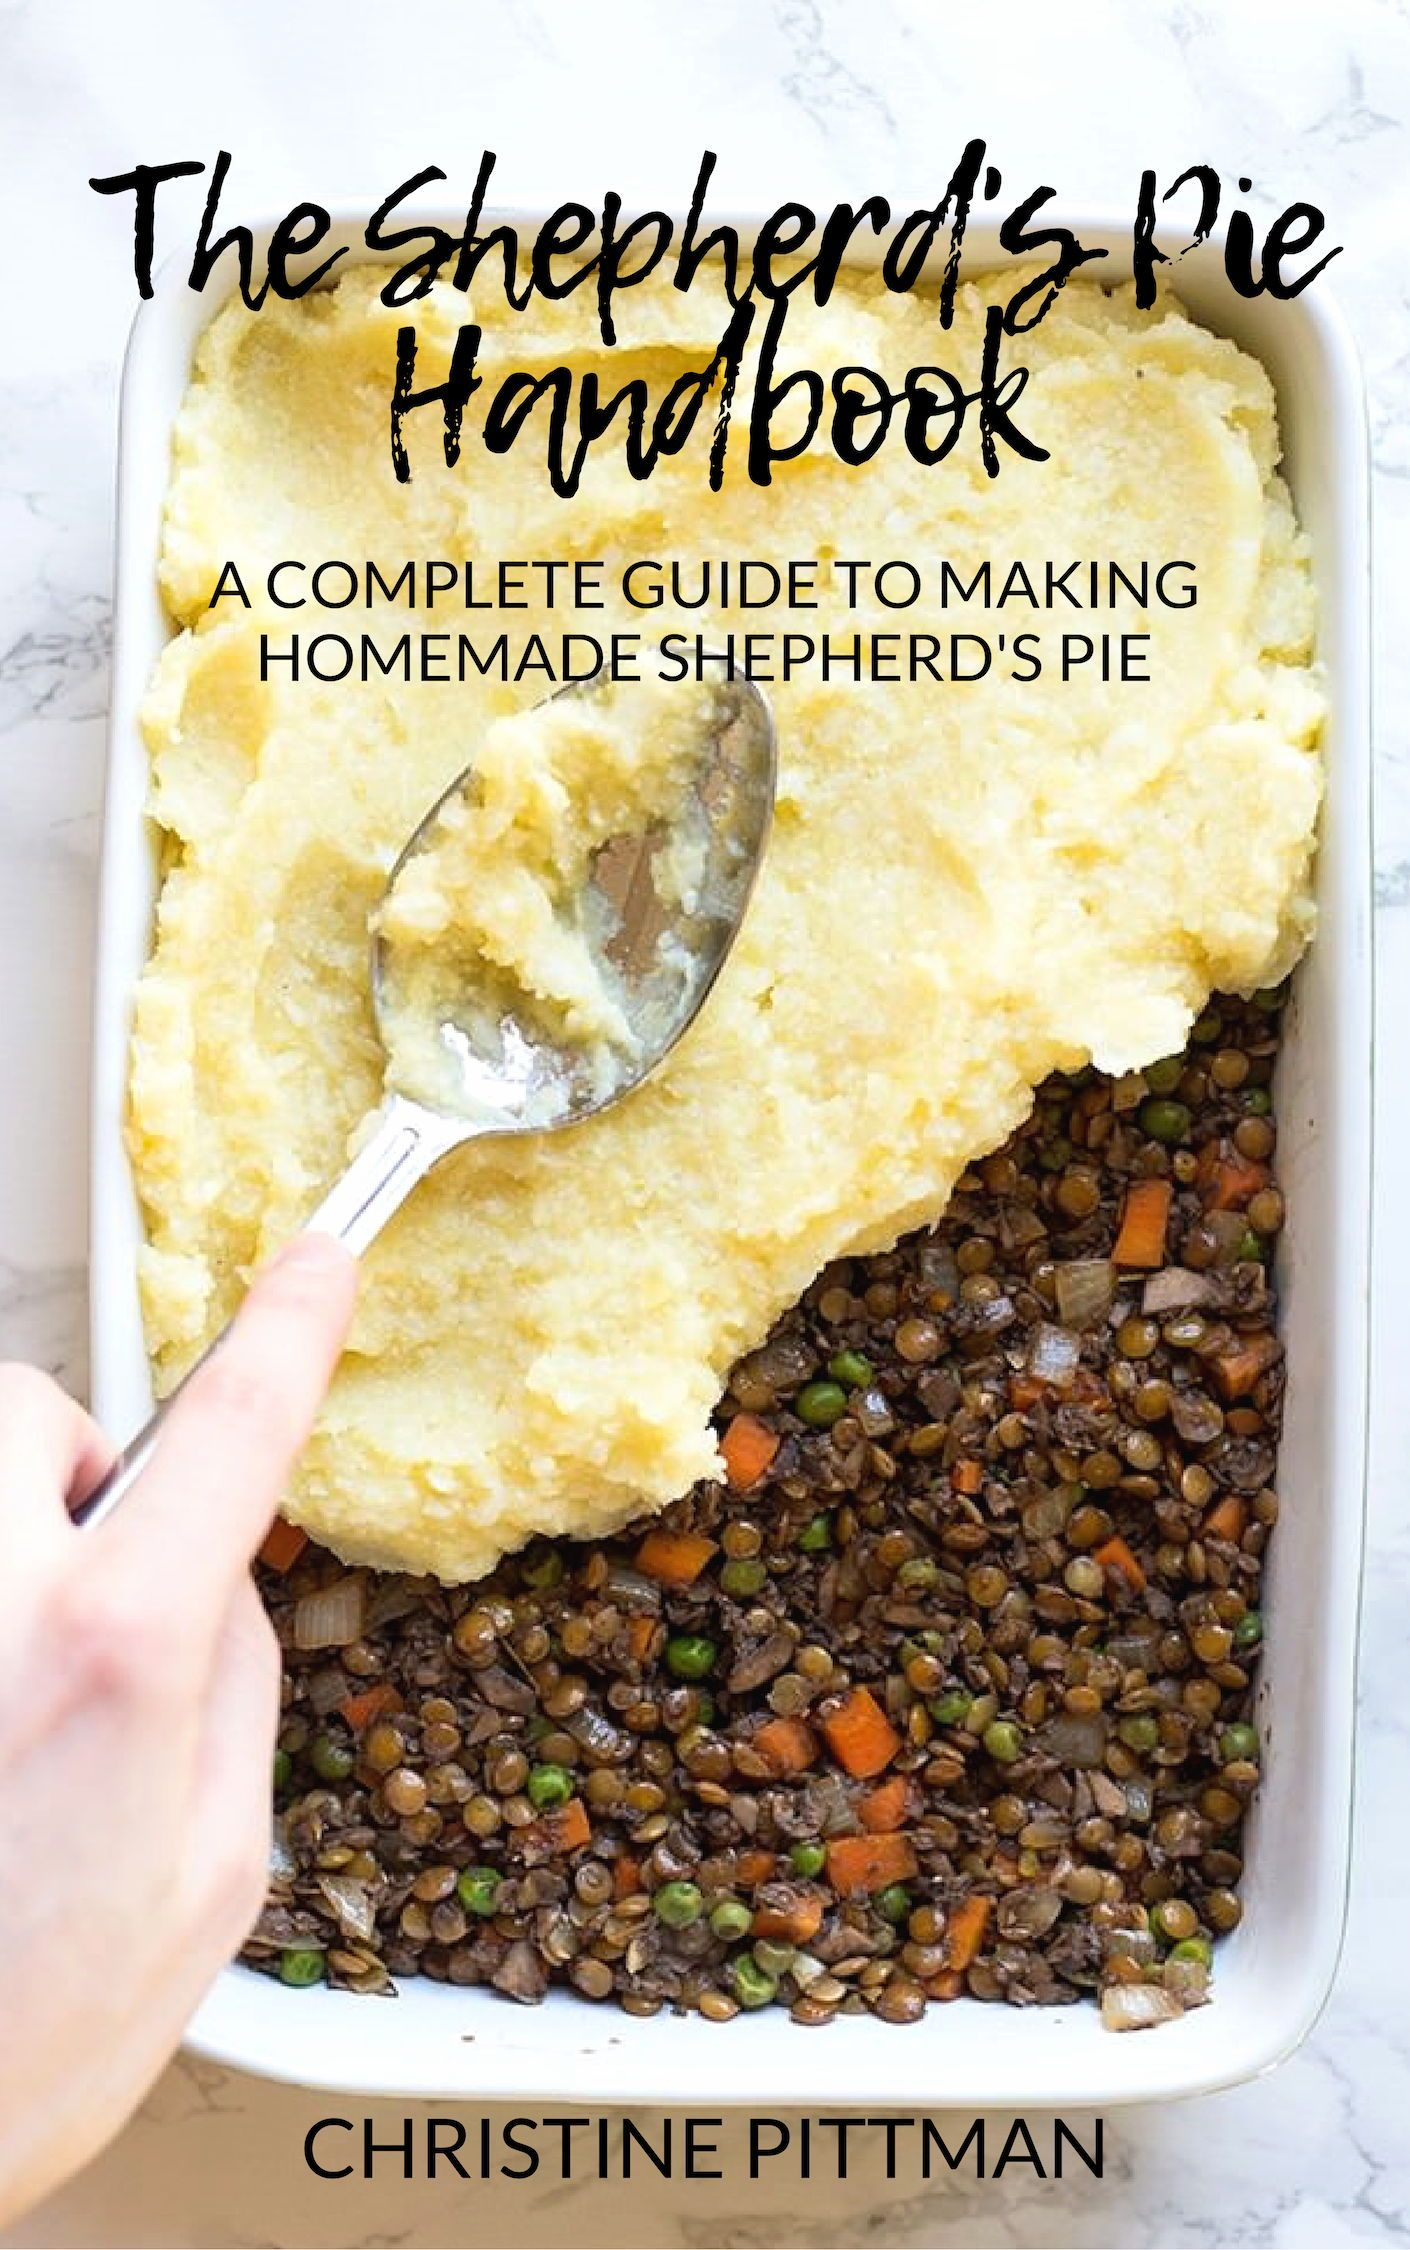 The Shepherd S Pie Handbook Goes Beyond Your Basic Shepherd S Pie You Ll Get Recipes To Make Shepherd S Pie Wi Shepherds Pie Homemade Shepherd S Pie Recipes